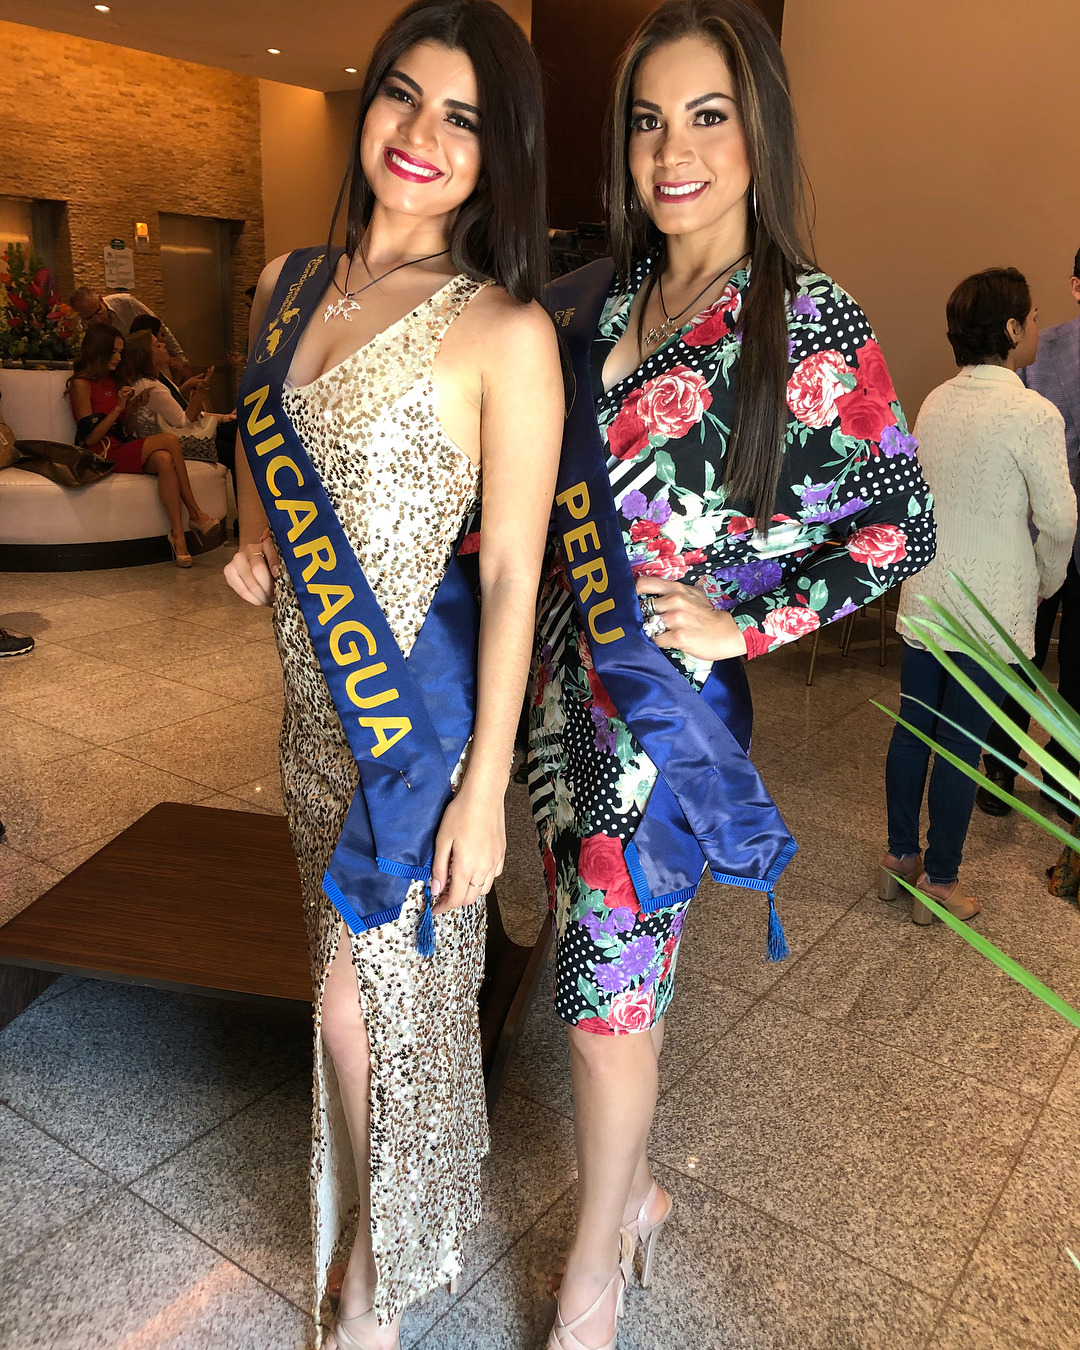 patricia seminario, miss peru continentes unidos 2018/miss asia pacific peru 2017. - Página 3 40003310